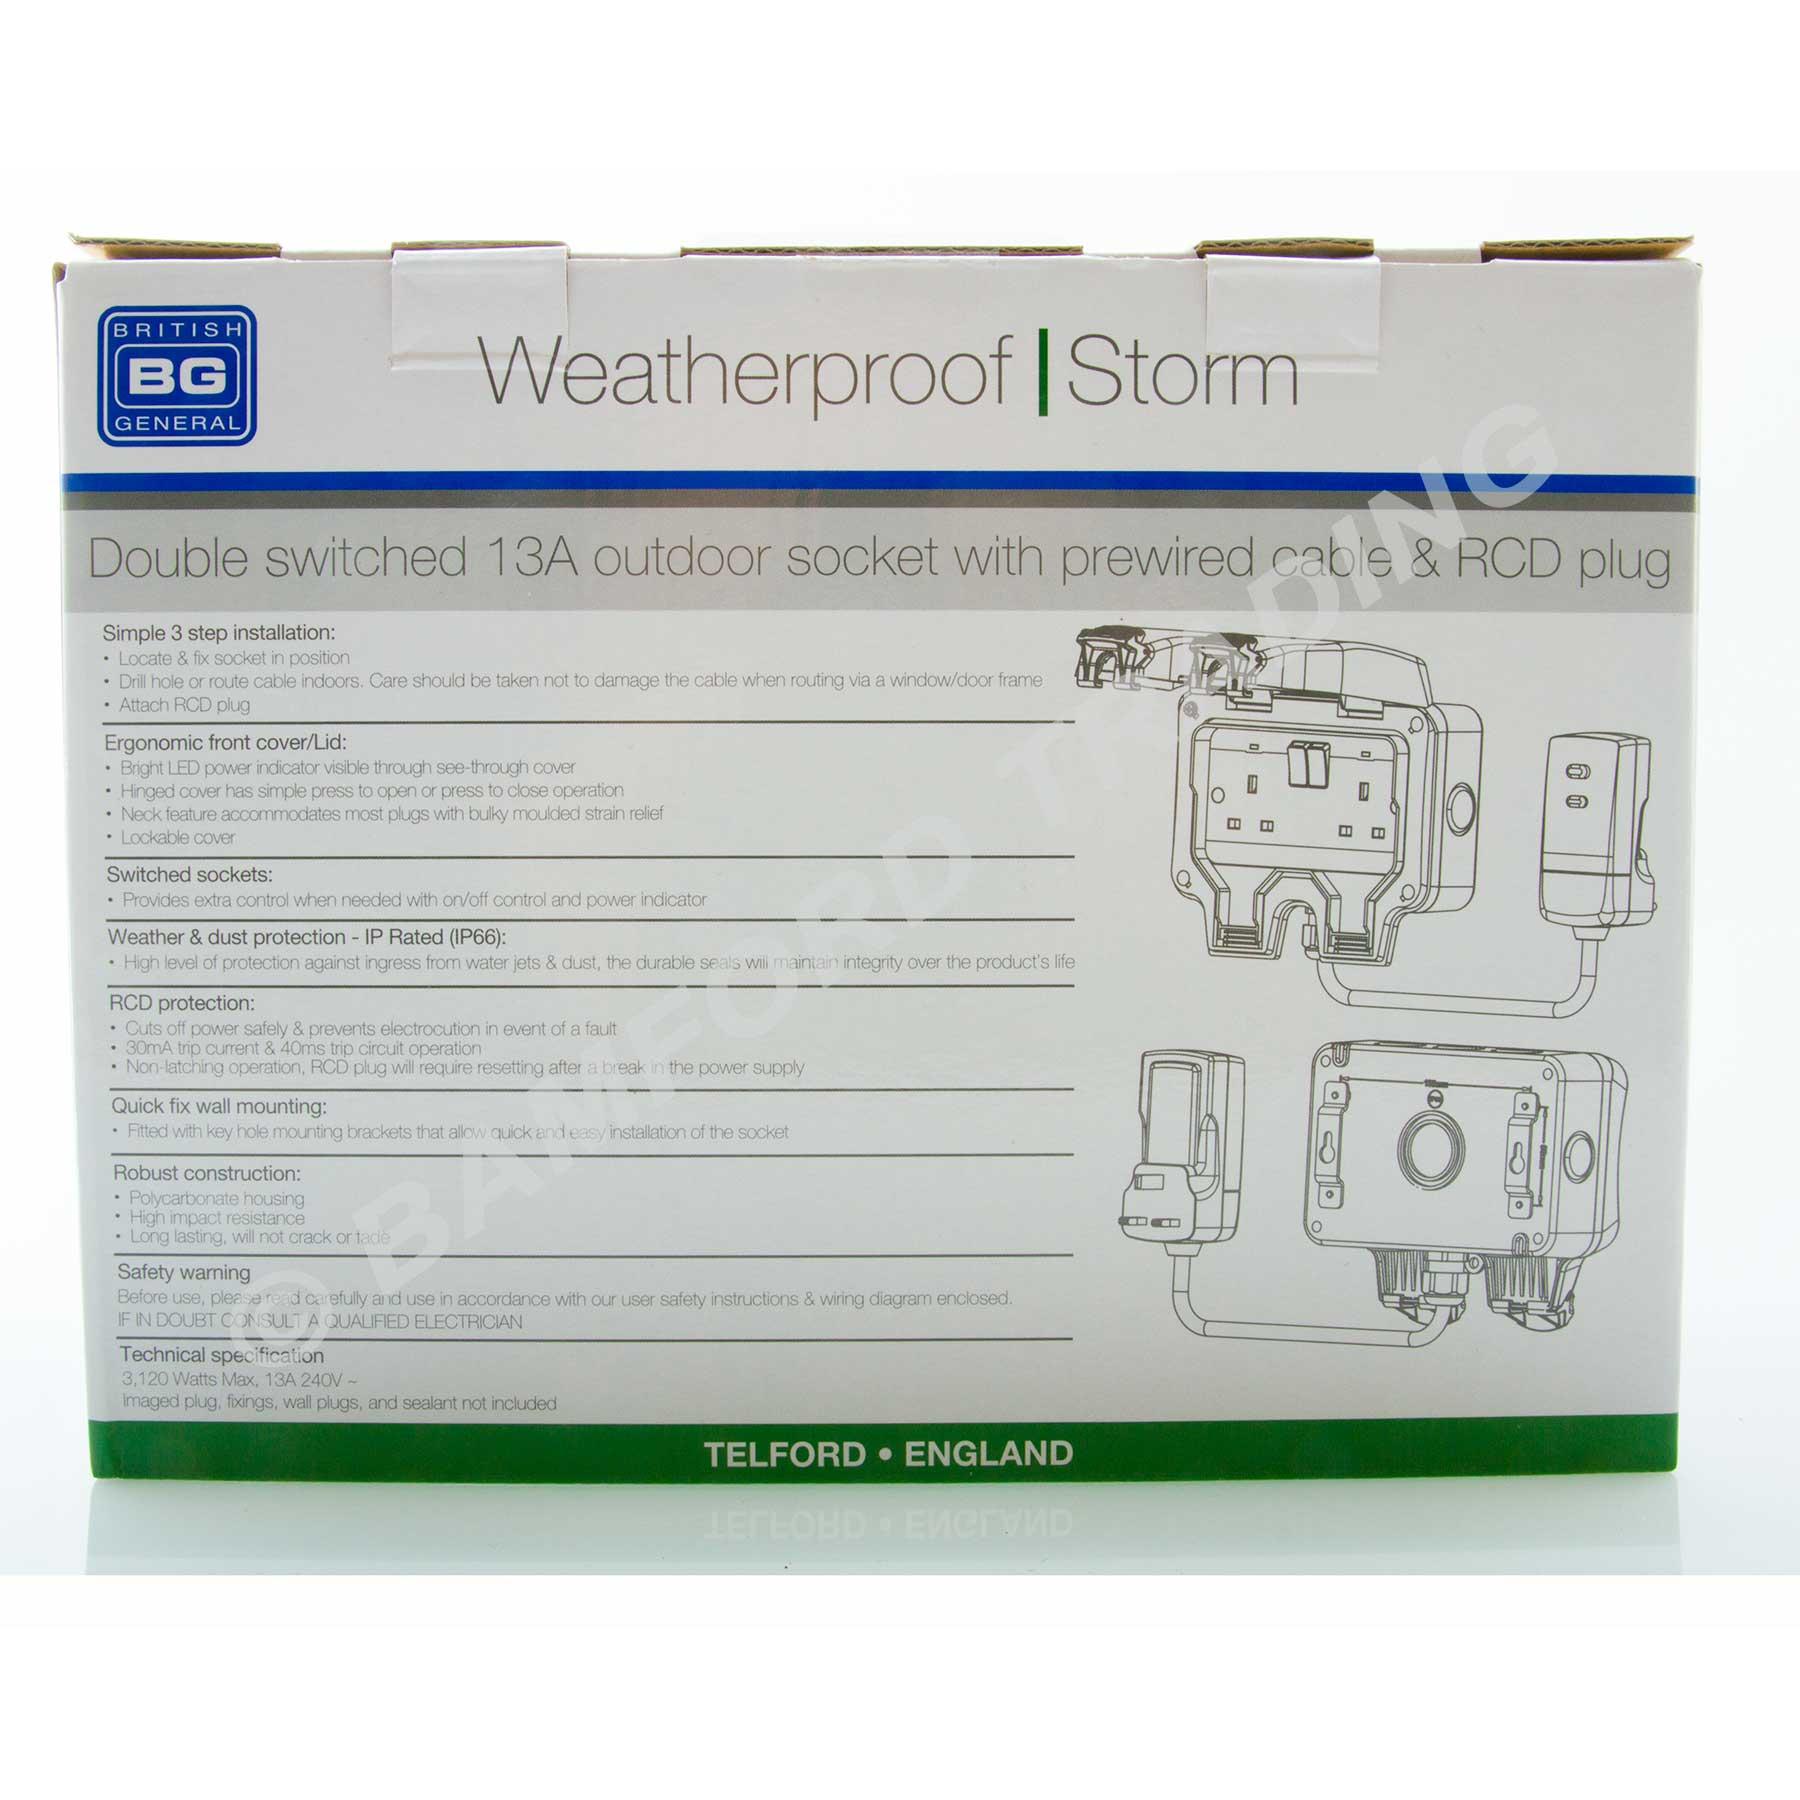 Masterplug Weatherproof Outdoor Mains Power Kit Nexus WP22KIT/3 ...